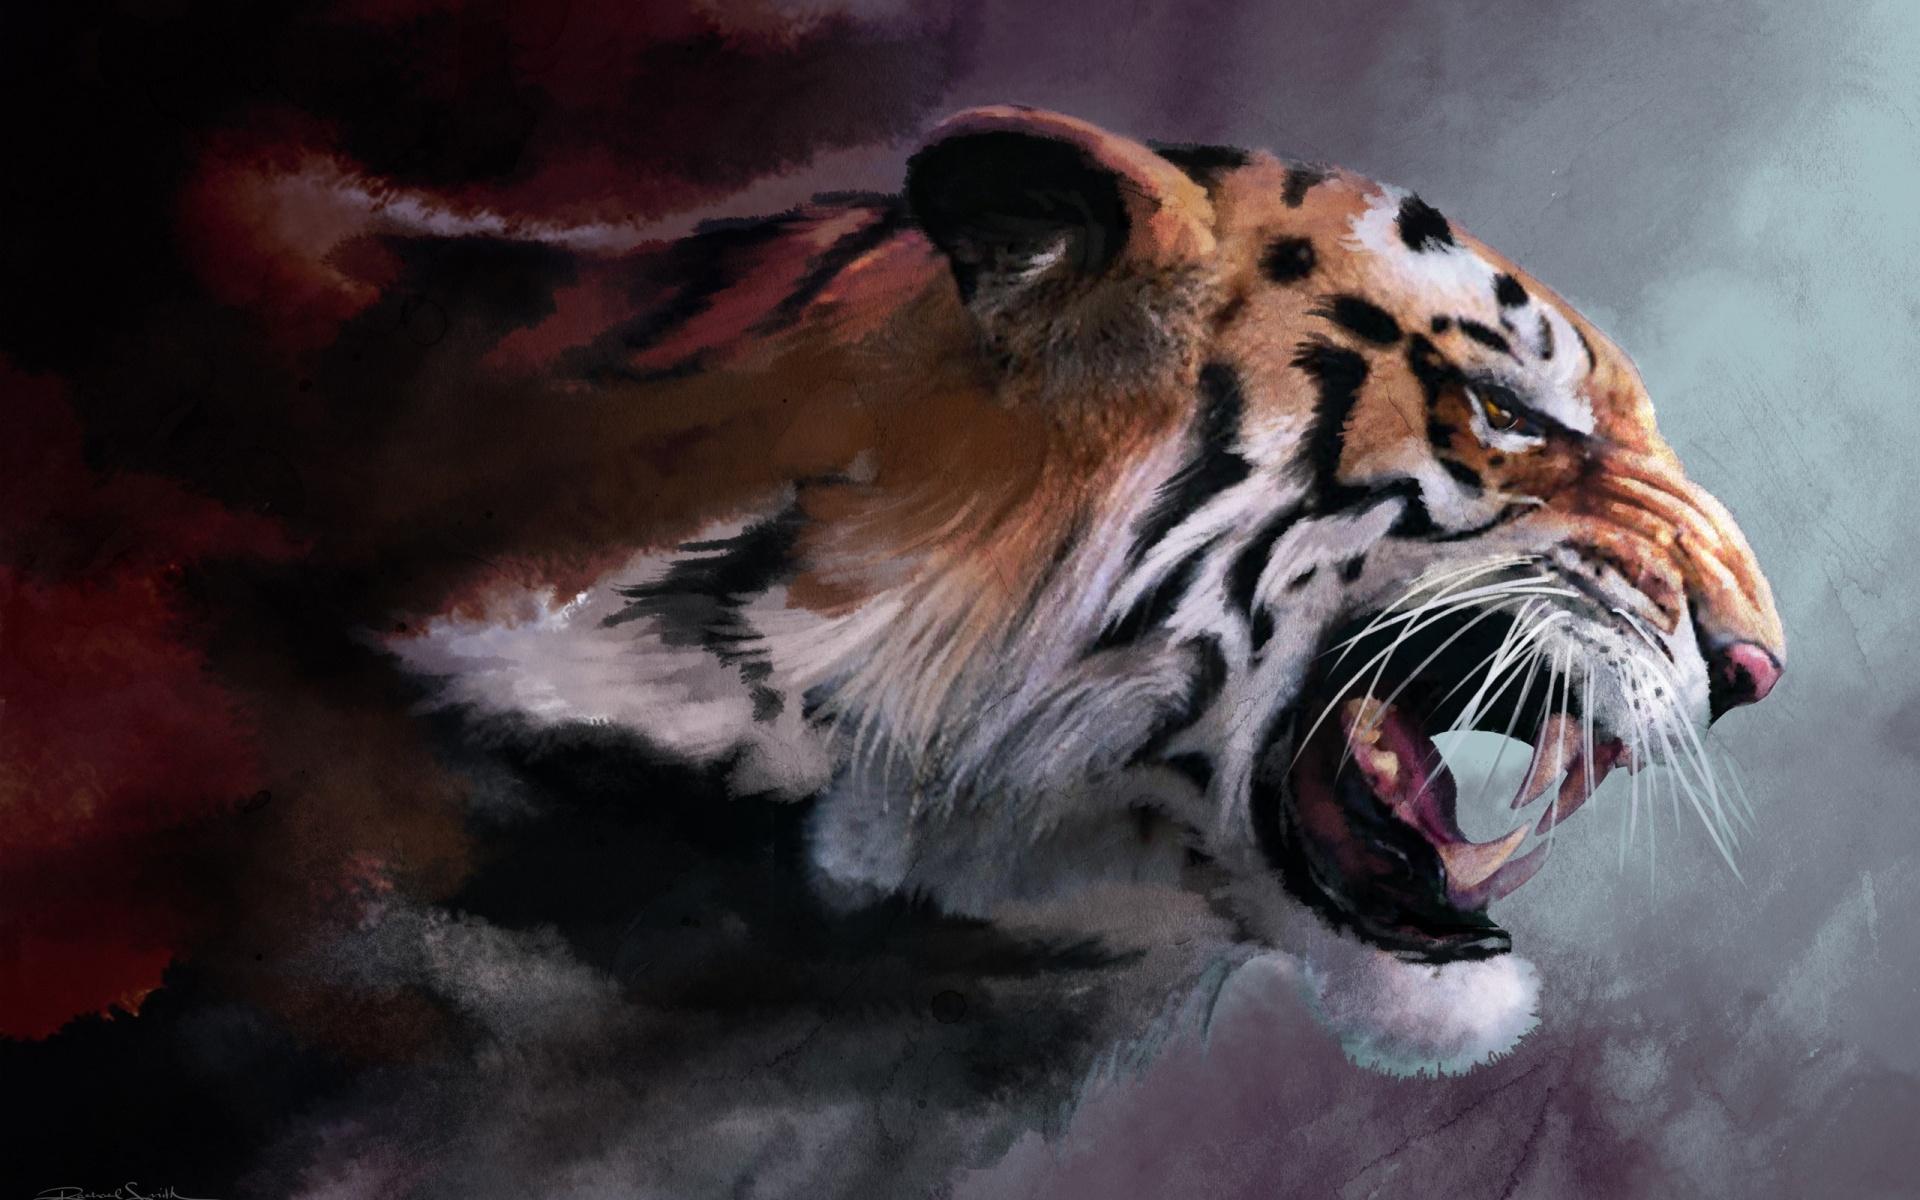 auburn-tigers-auburn-tigers-desktop-Wallpowper-wallpaper-wp6002124